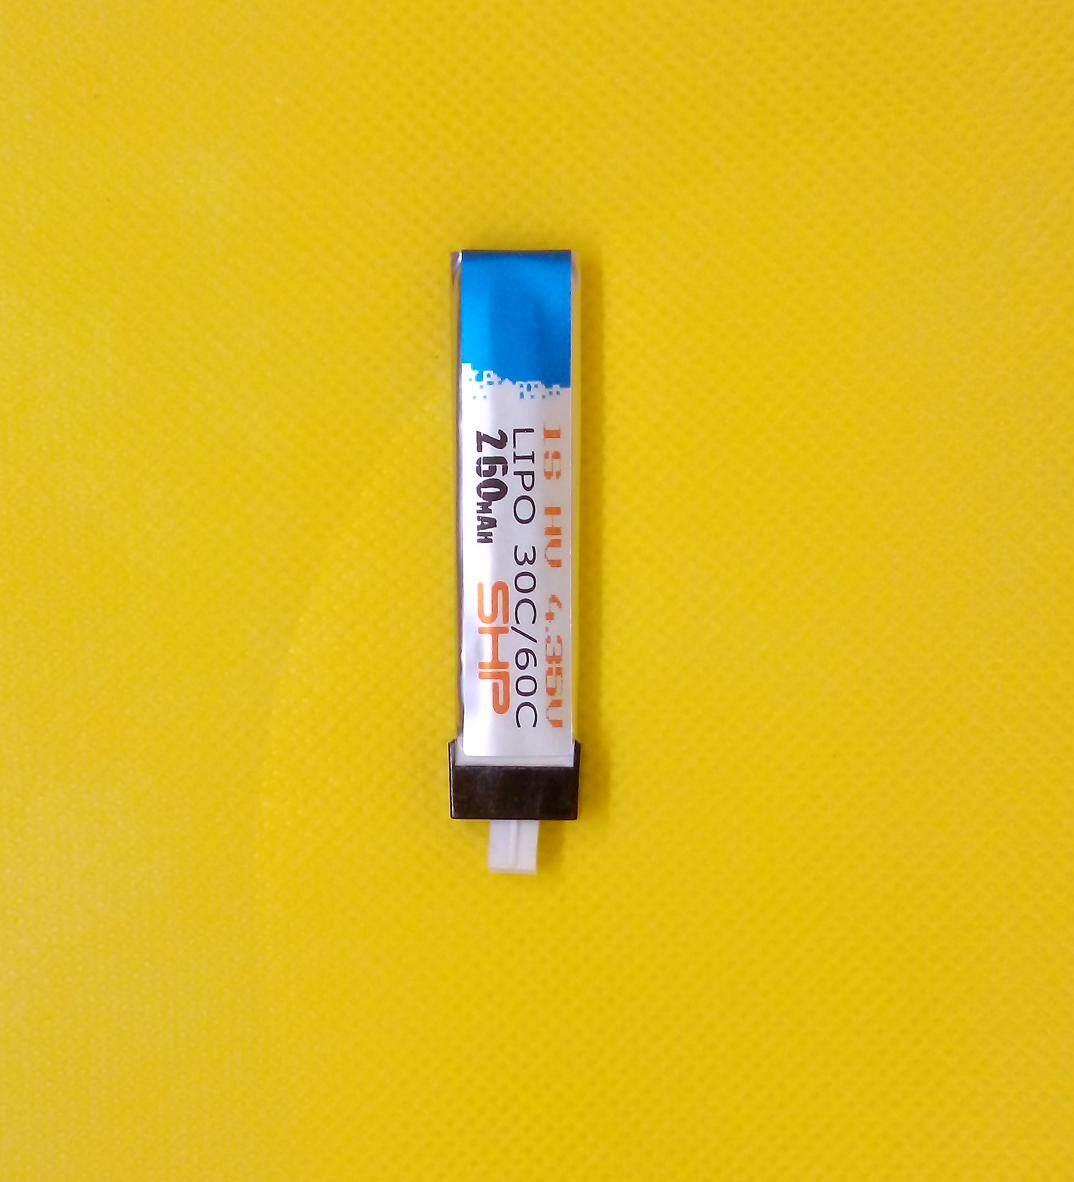 2018 New!! Shp 1s Lipo Battery High-Voltage Hv 4.35v 30c/60c 260mah Tinywhoop Betafpv Micro Quad Fpv Racer Batteries - 2018 ใหม่ !! Shp 1s Lipo แบตเตอรี่แรงดันไฟฟ้าสูง Hv 4.35v 30c / 60c 260mah Tinywhoop แบตเตอรี่ Betafpv Micro Quad Fpv Racer Batteries